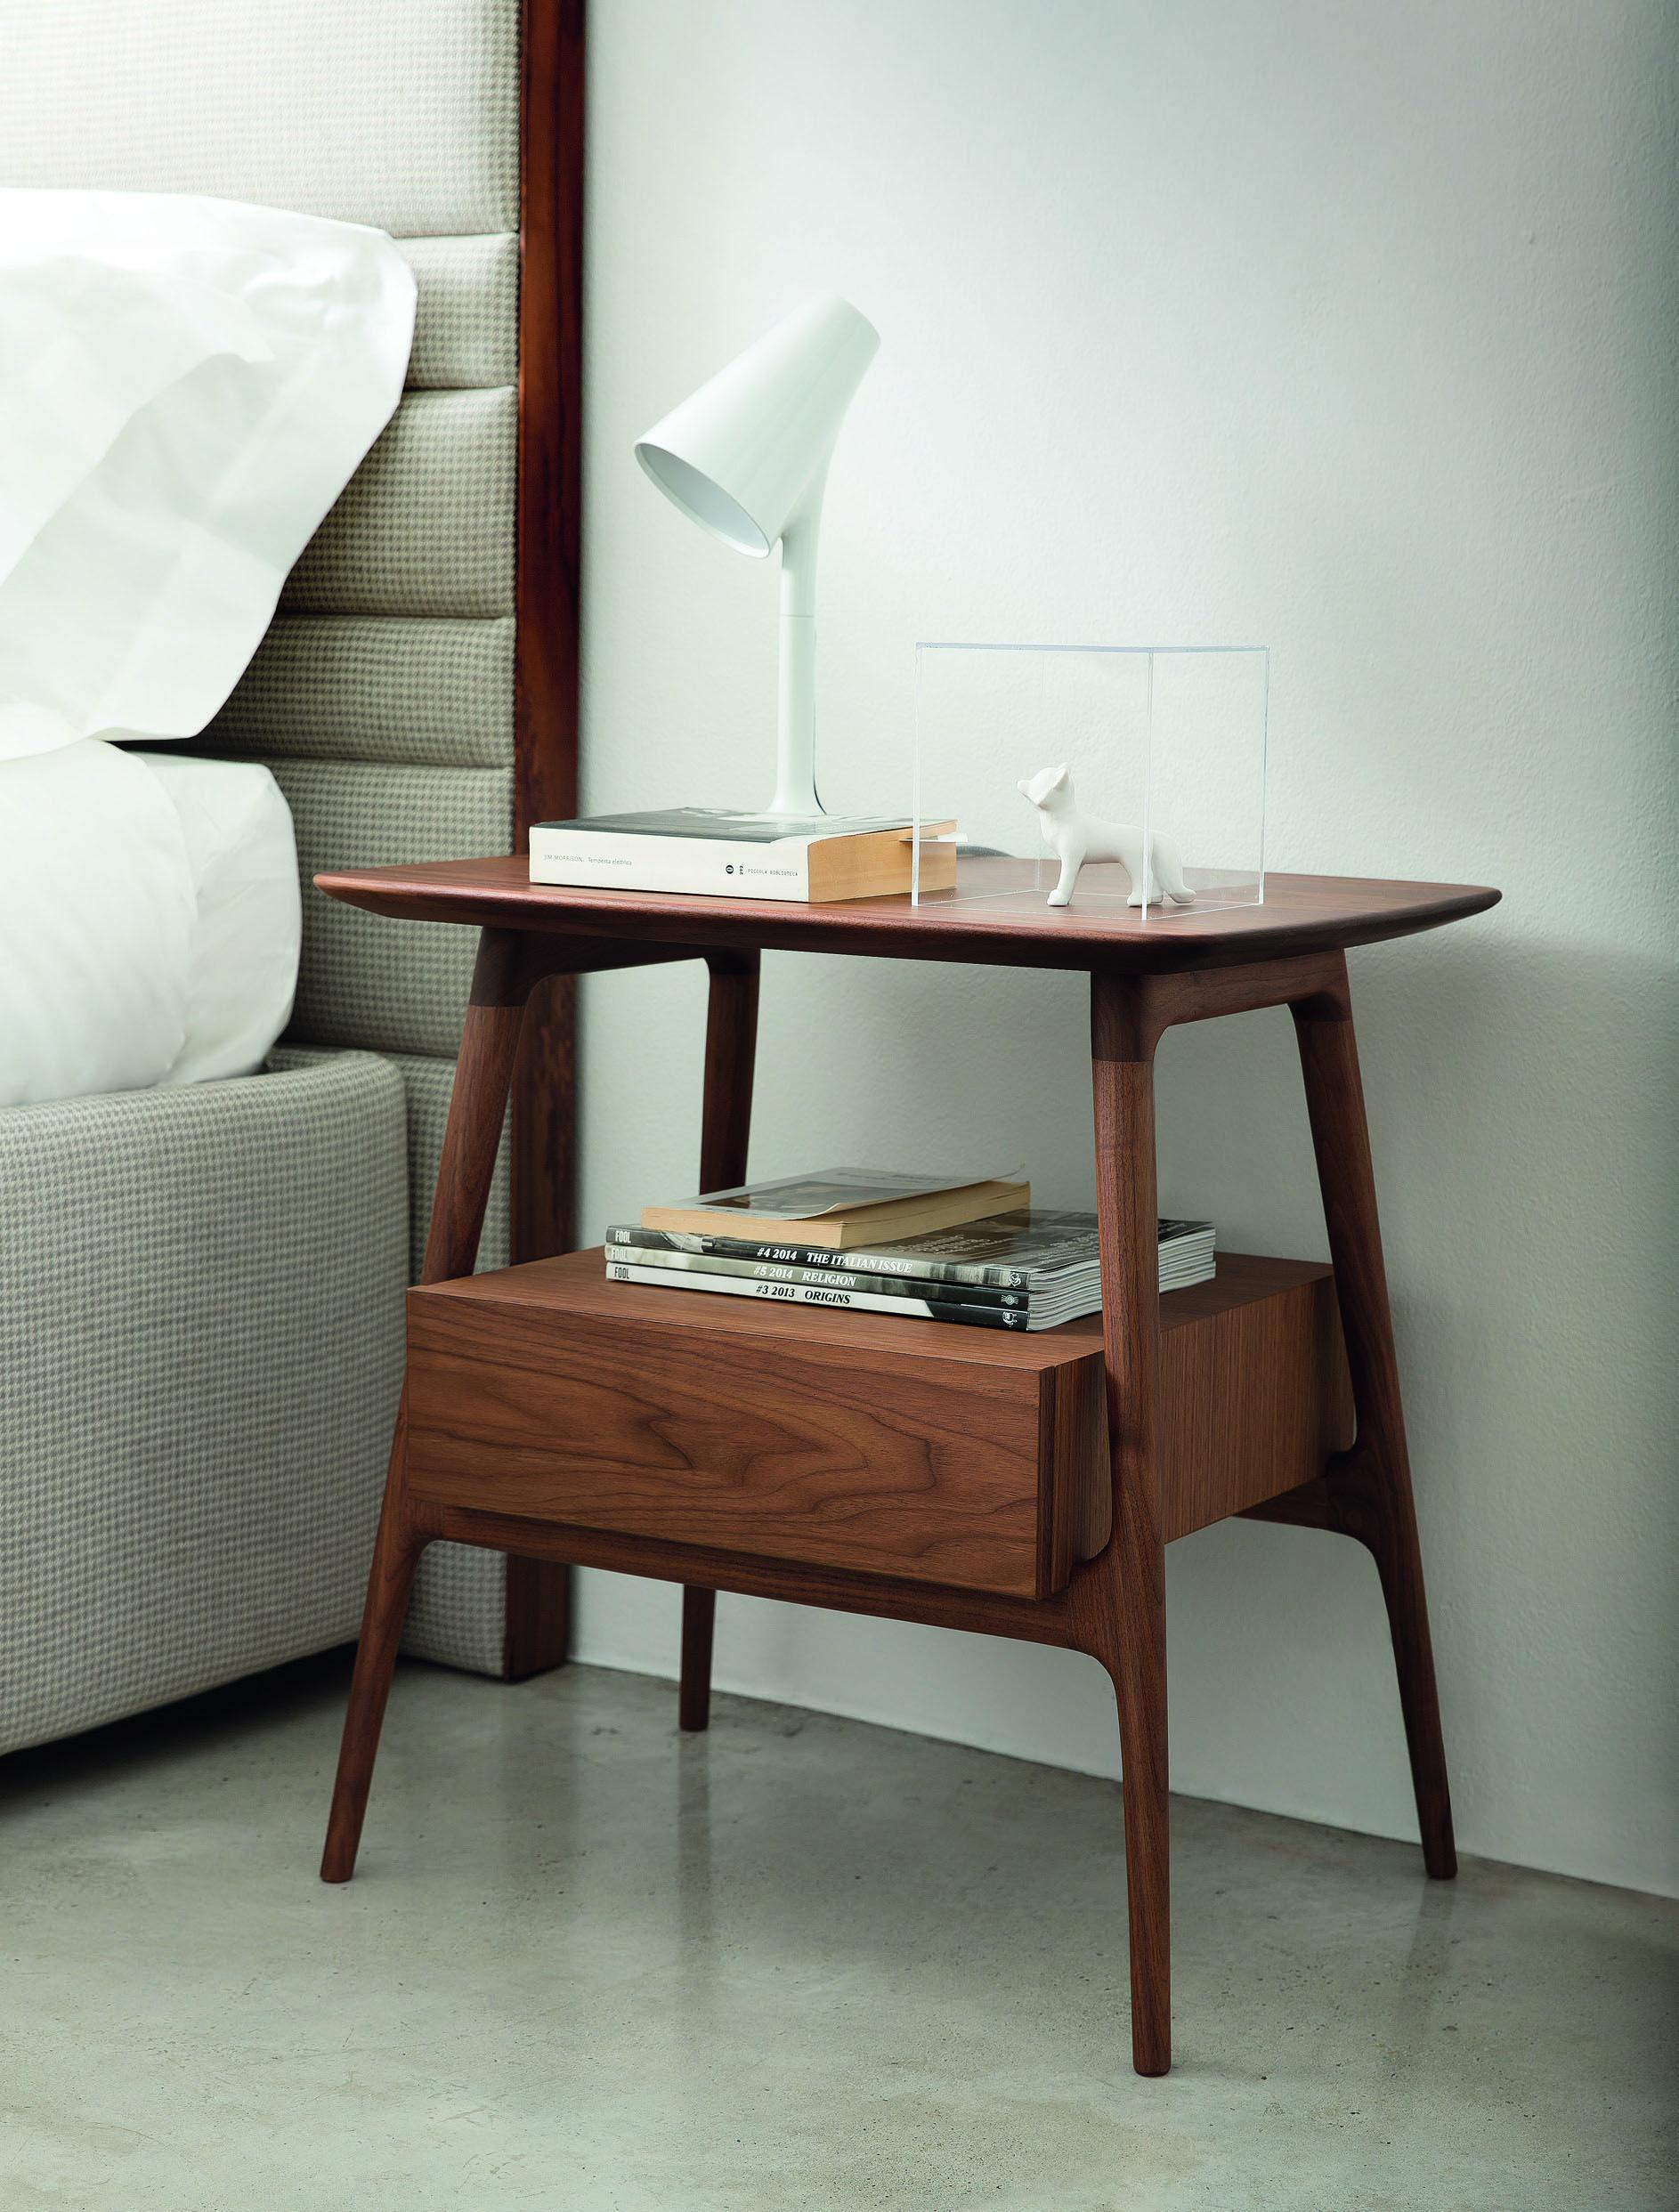 Bilot night table Furniture, Interior, Home furniture